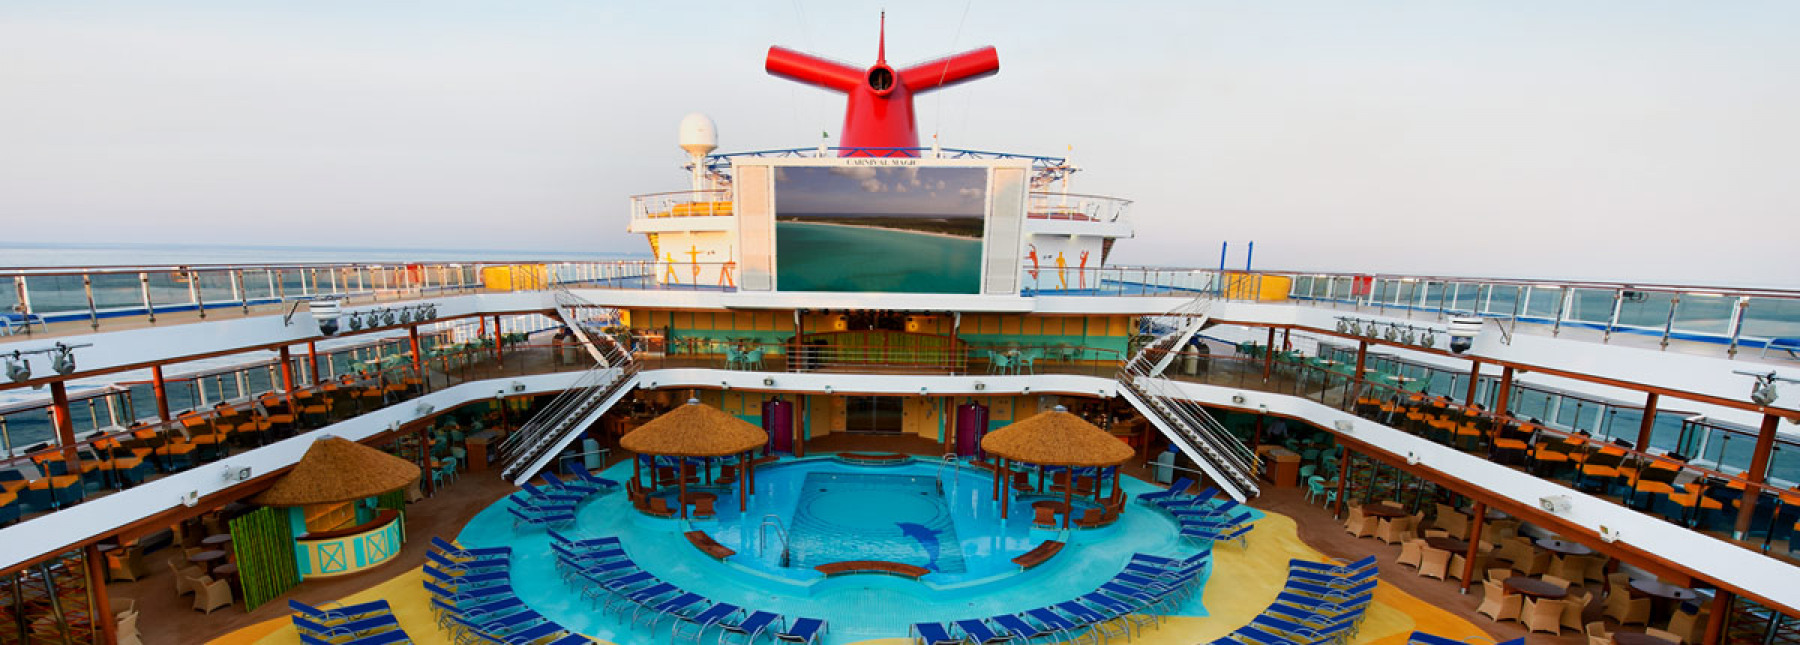 Carnival Cruise Lines Carnival Dream Exterior carnival-seaside-theater-1.jpg